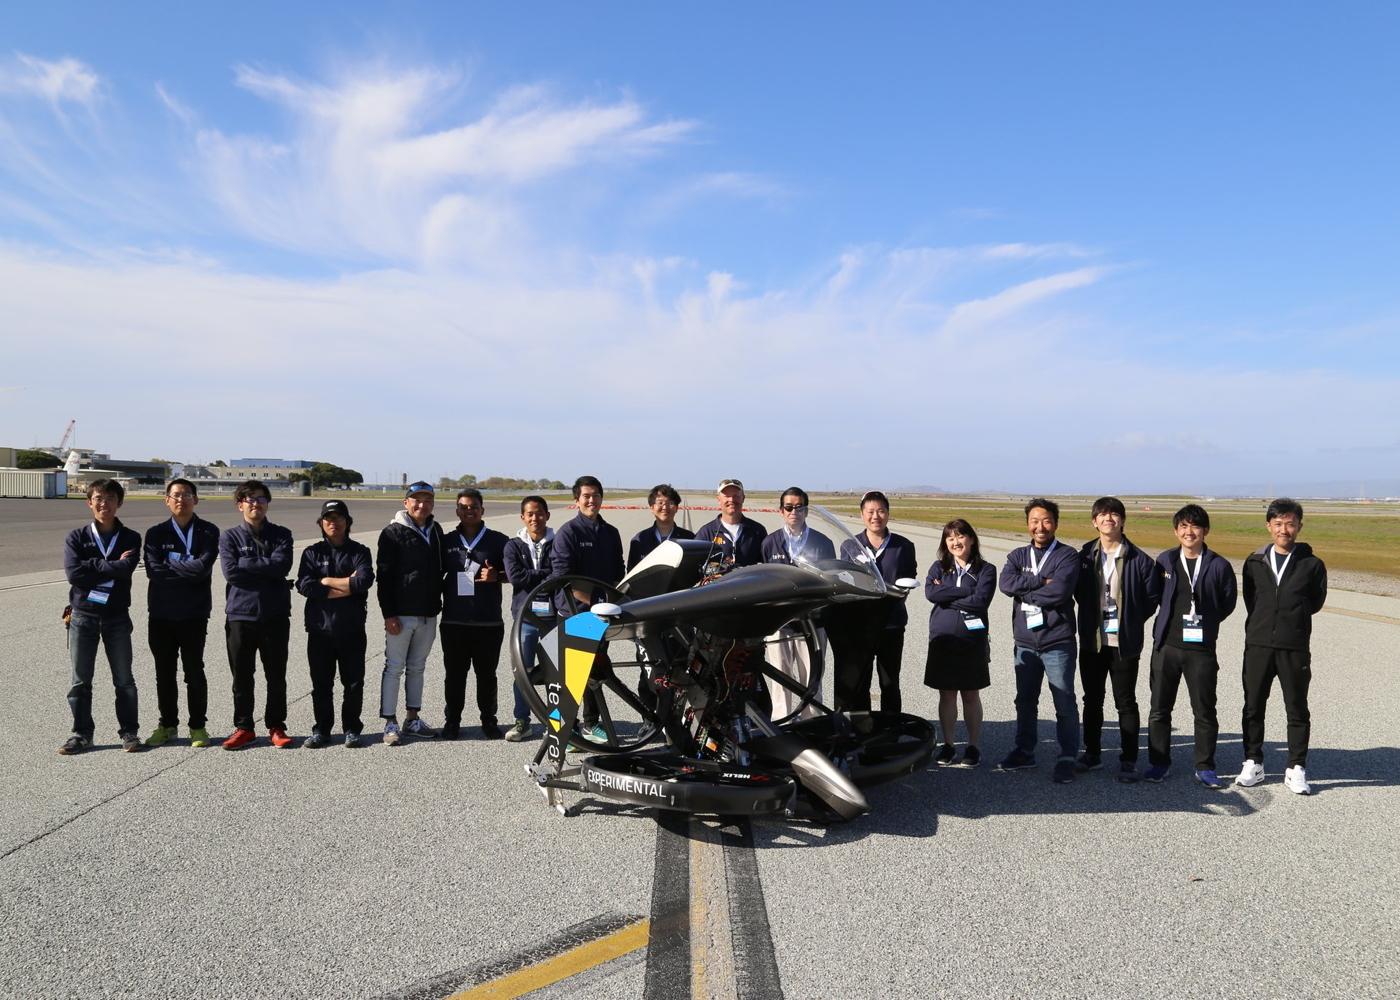 teTra Aviation team at GoFly Prize event